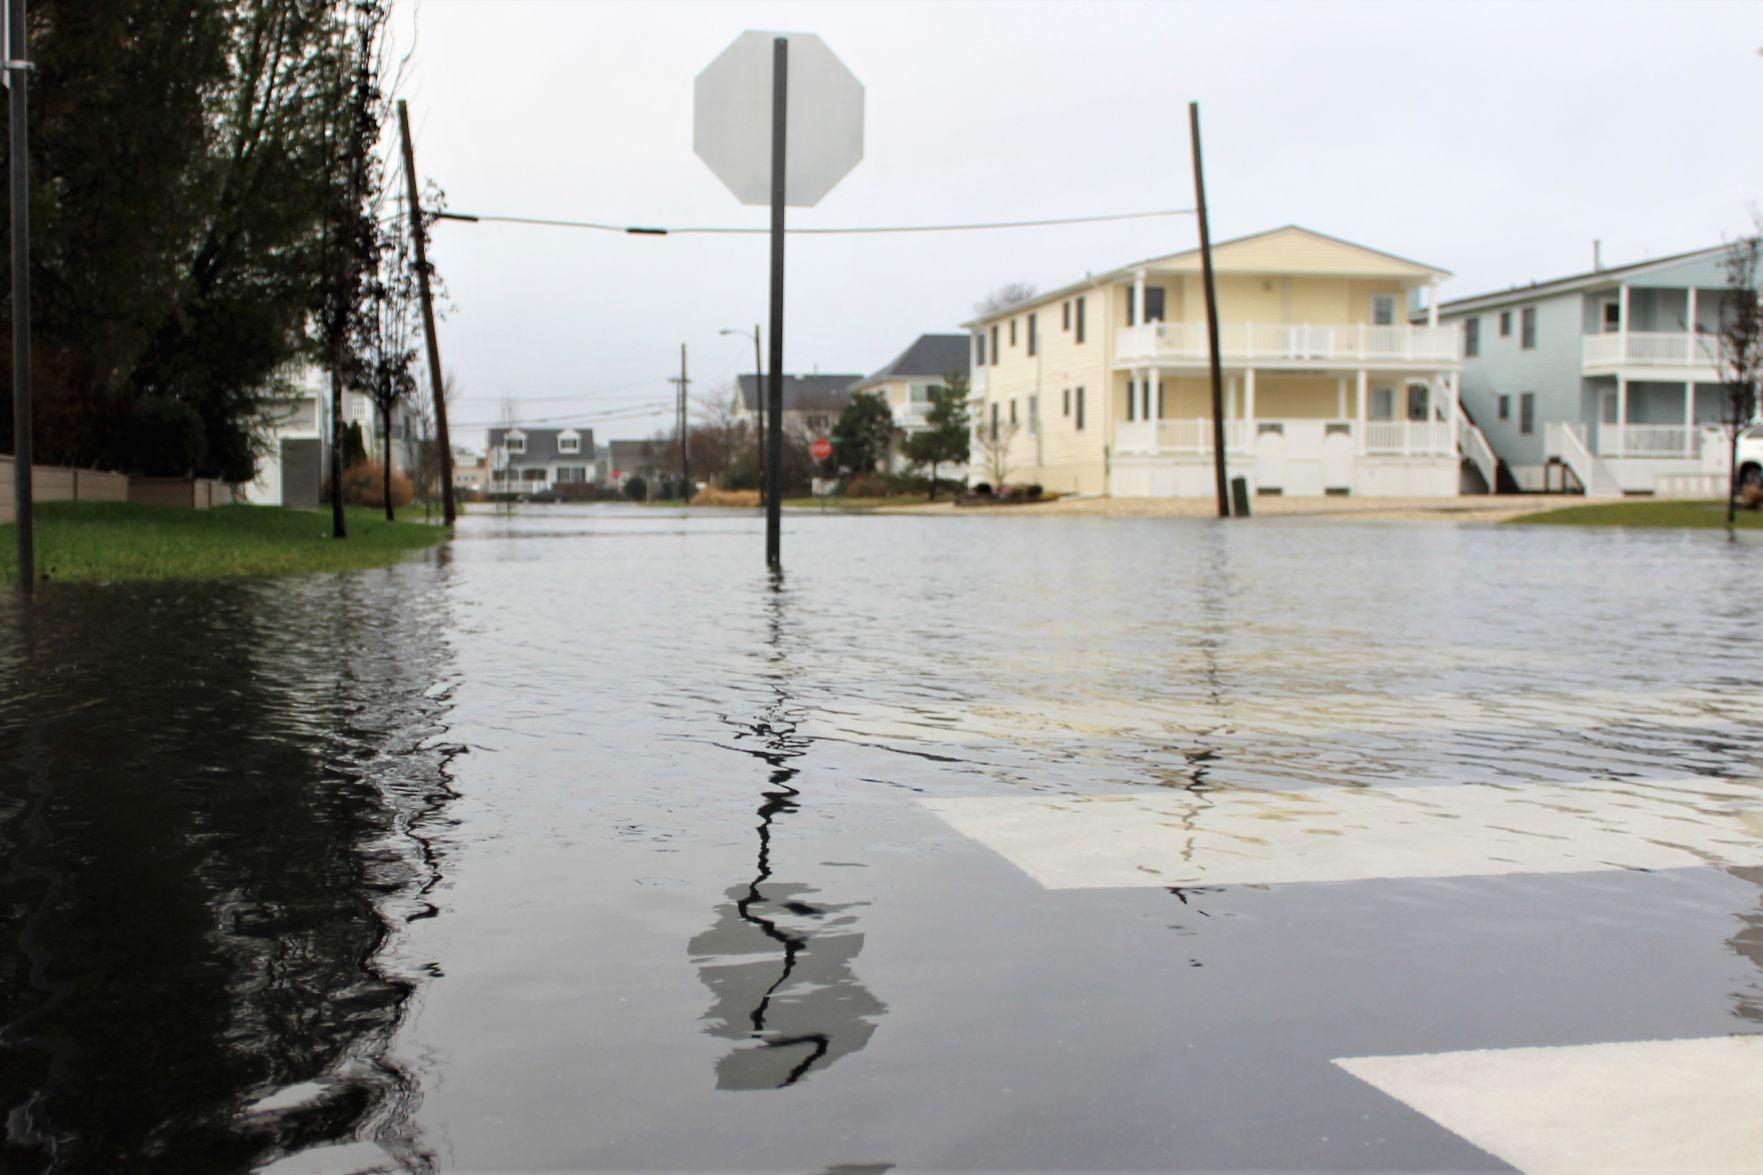 after delays frustrations end is near for ocean city flooding rh pressofatlanticcity com